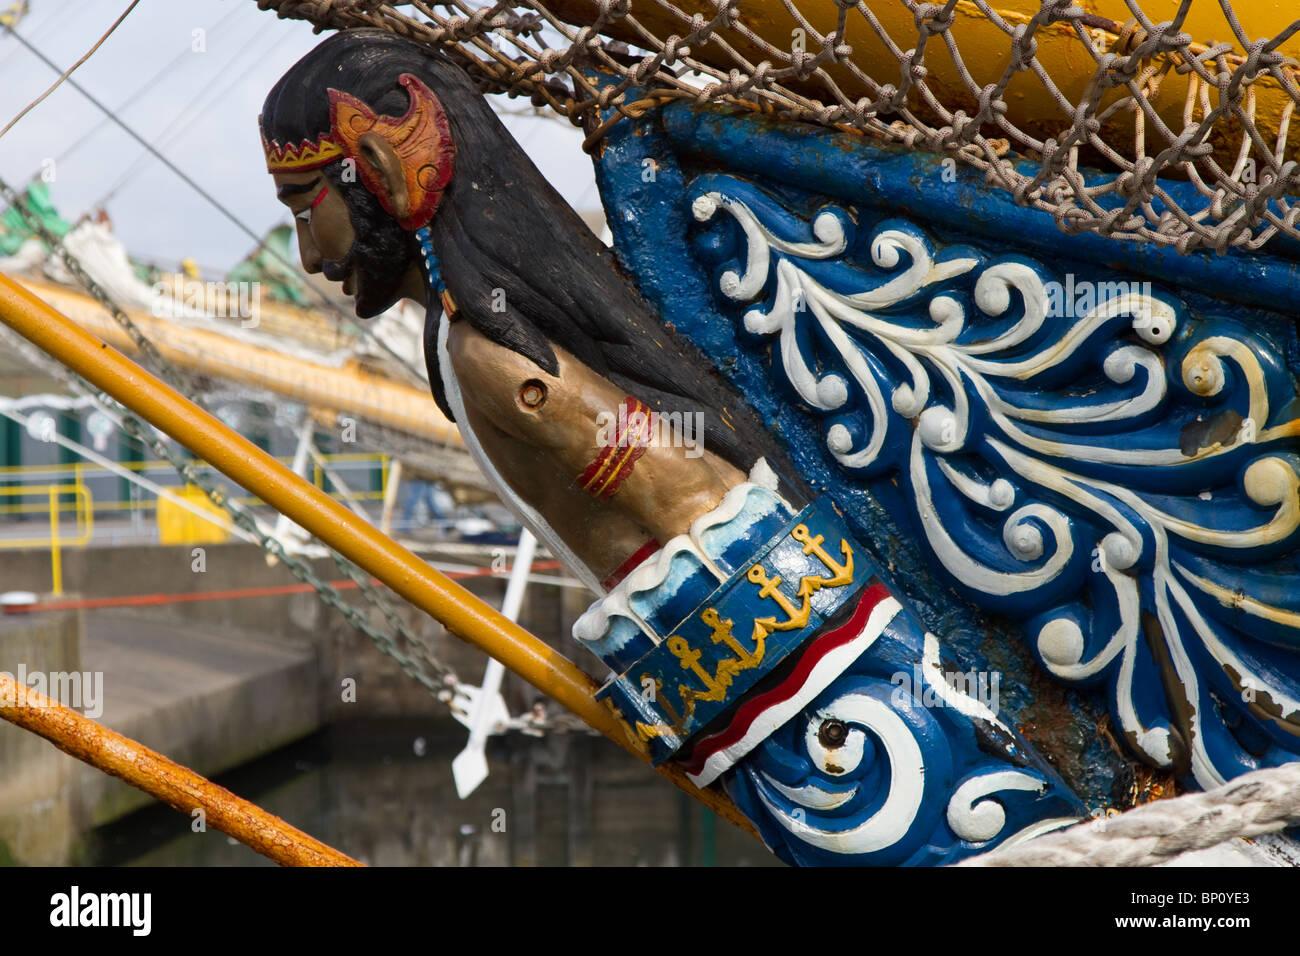 Figurehead, figurehead, ship, boat, sail, sea, wood, vessel, bow, rope, old, ancient, flag, history, mast, galleon, - Stock Image